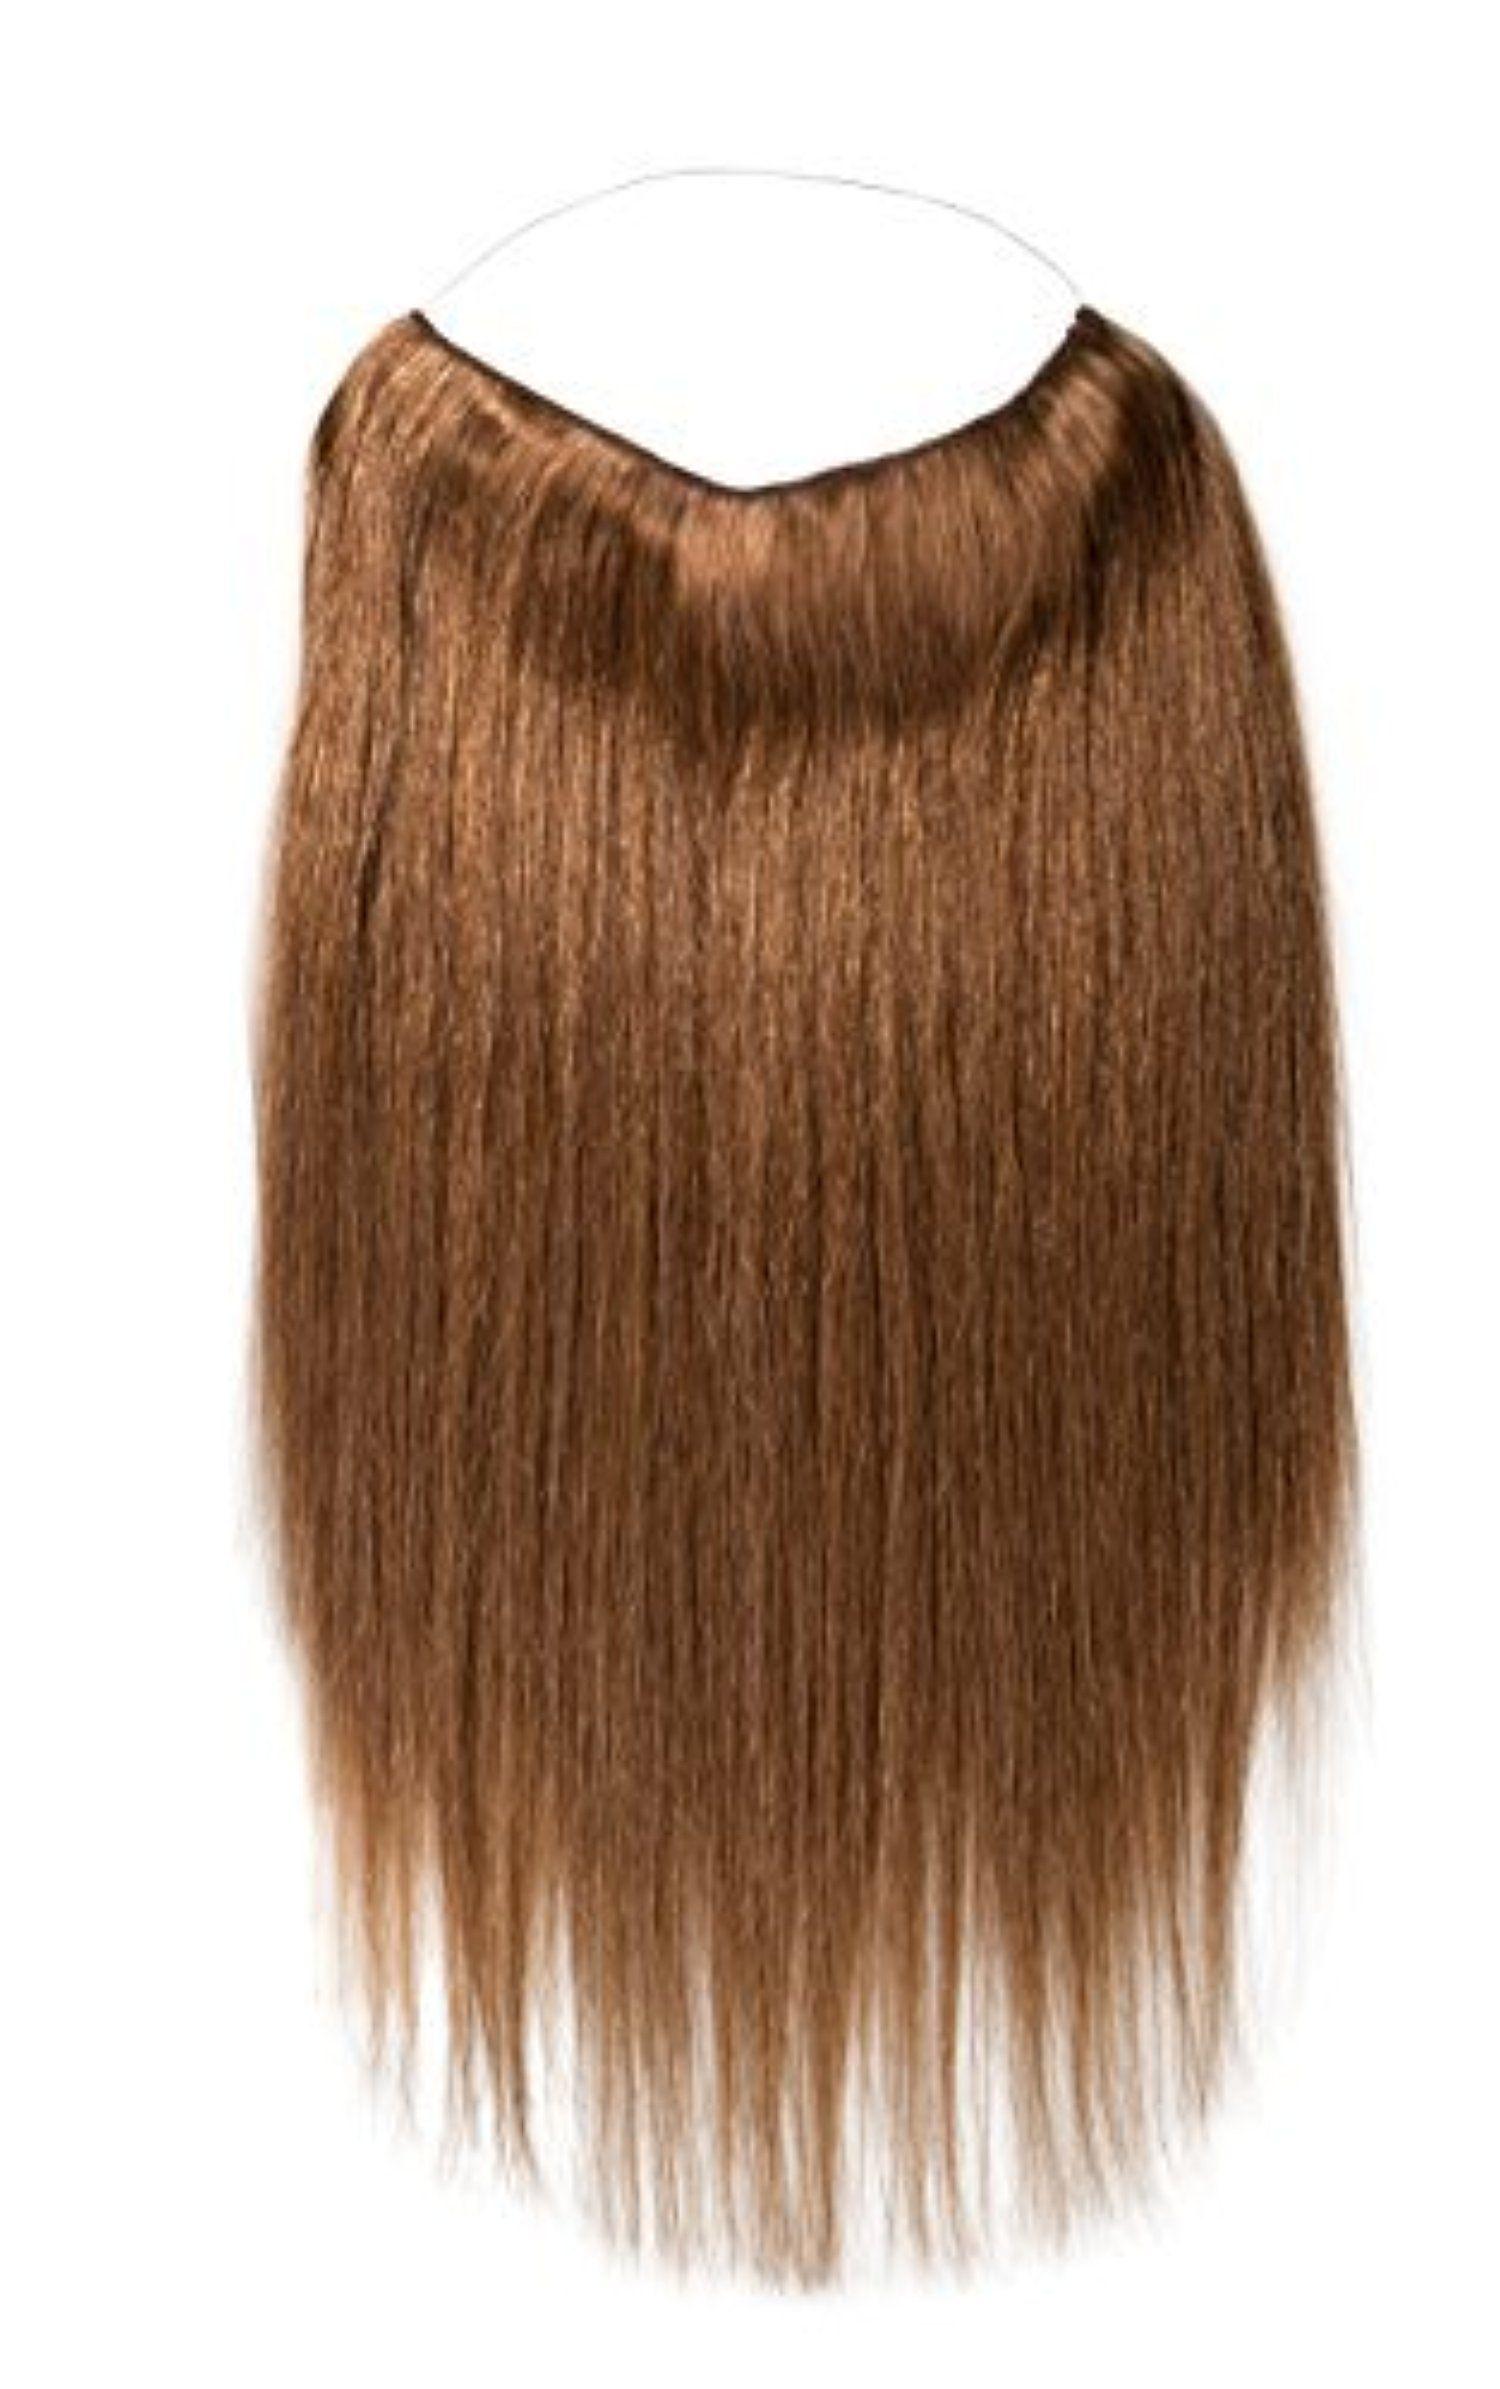 Sono 1 Count 155 G 18 Solo Straight Sono 1 Count 100 Human Hair